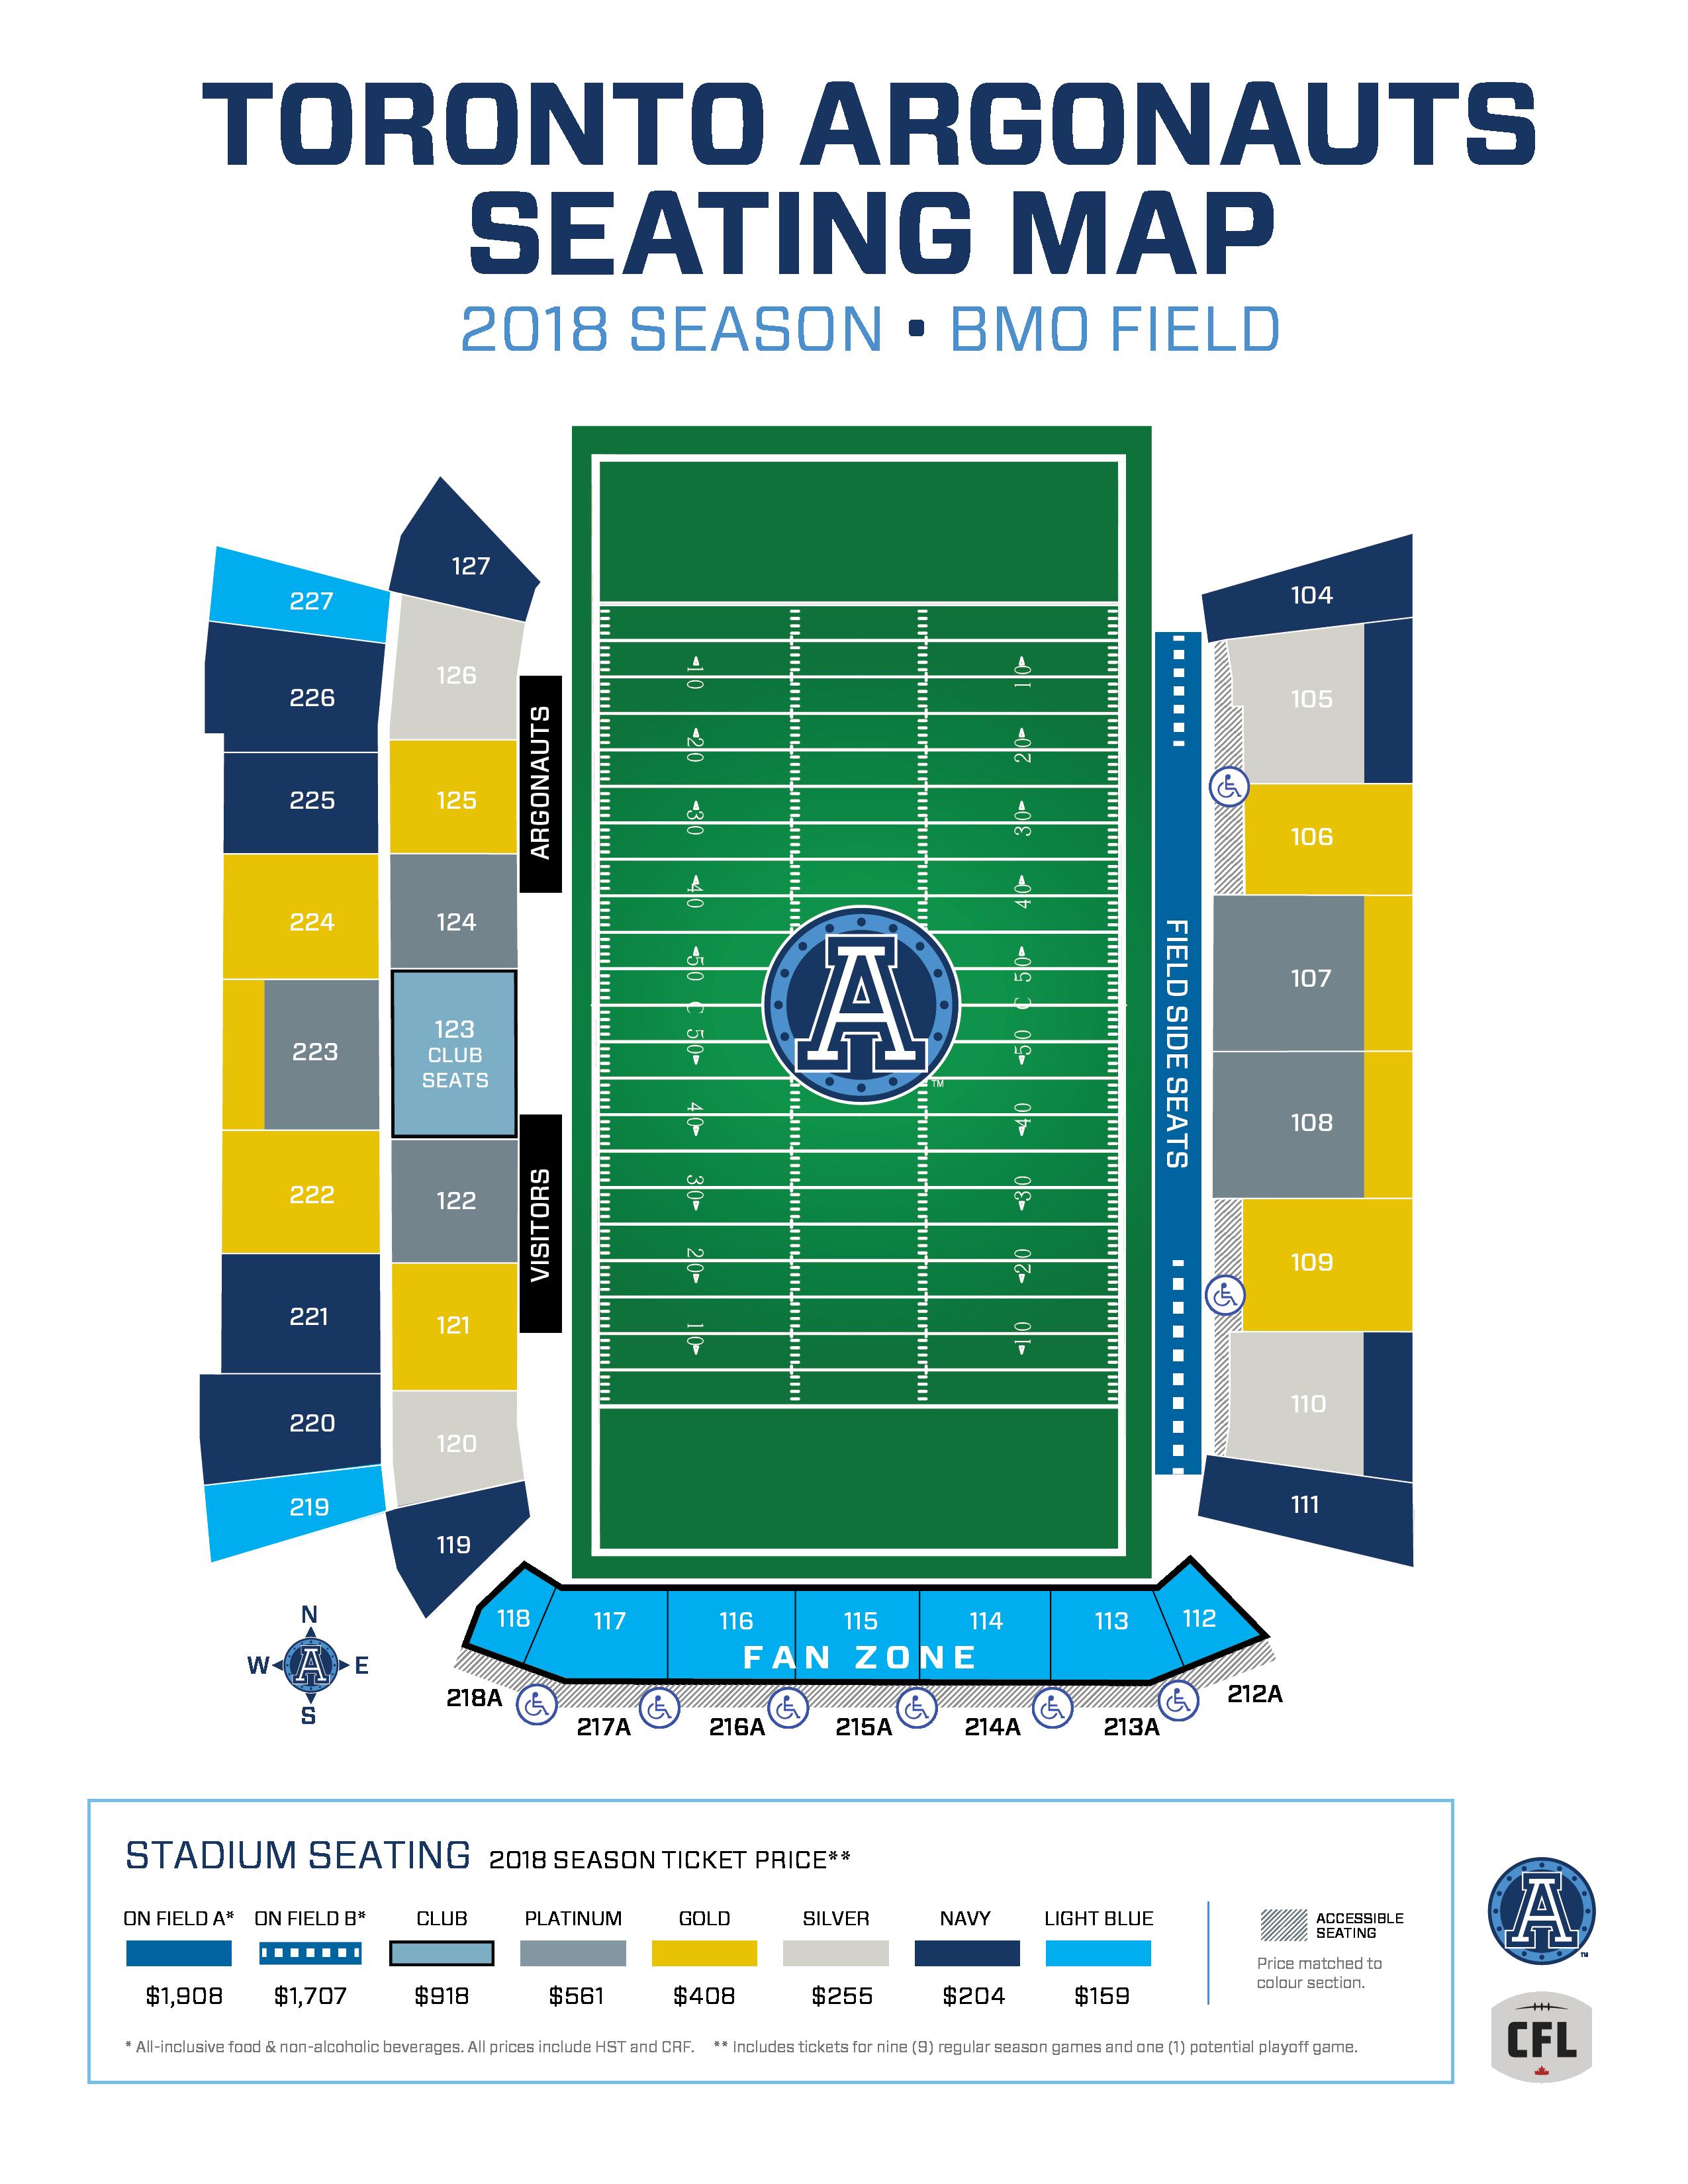 Toronto Argonauts Seating Map 2018